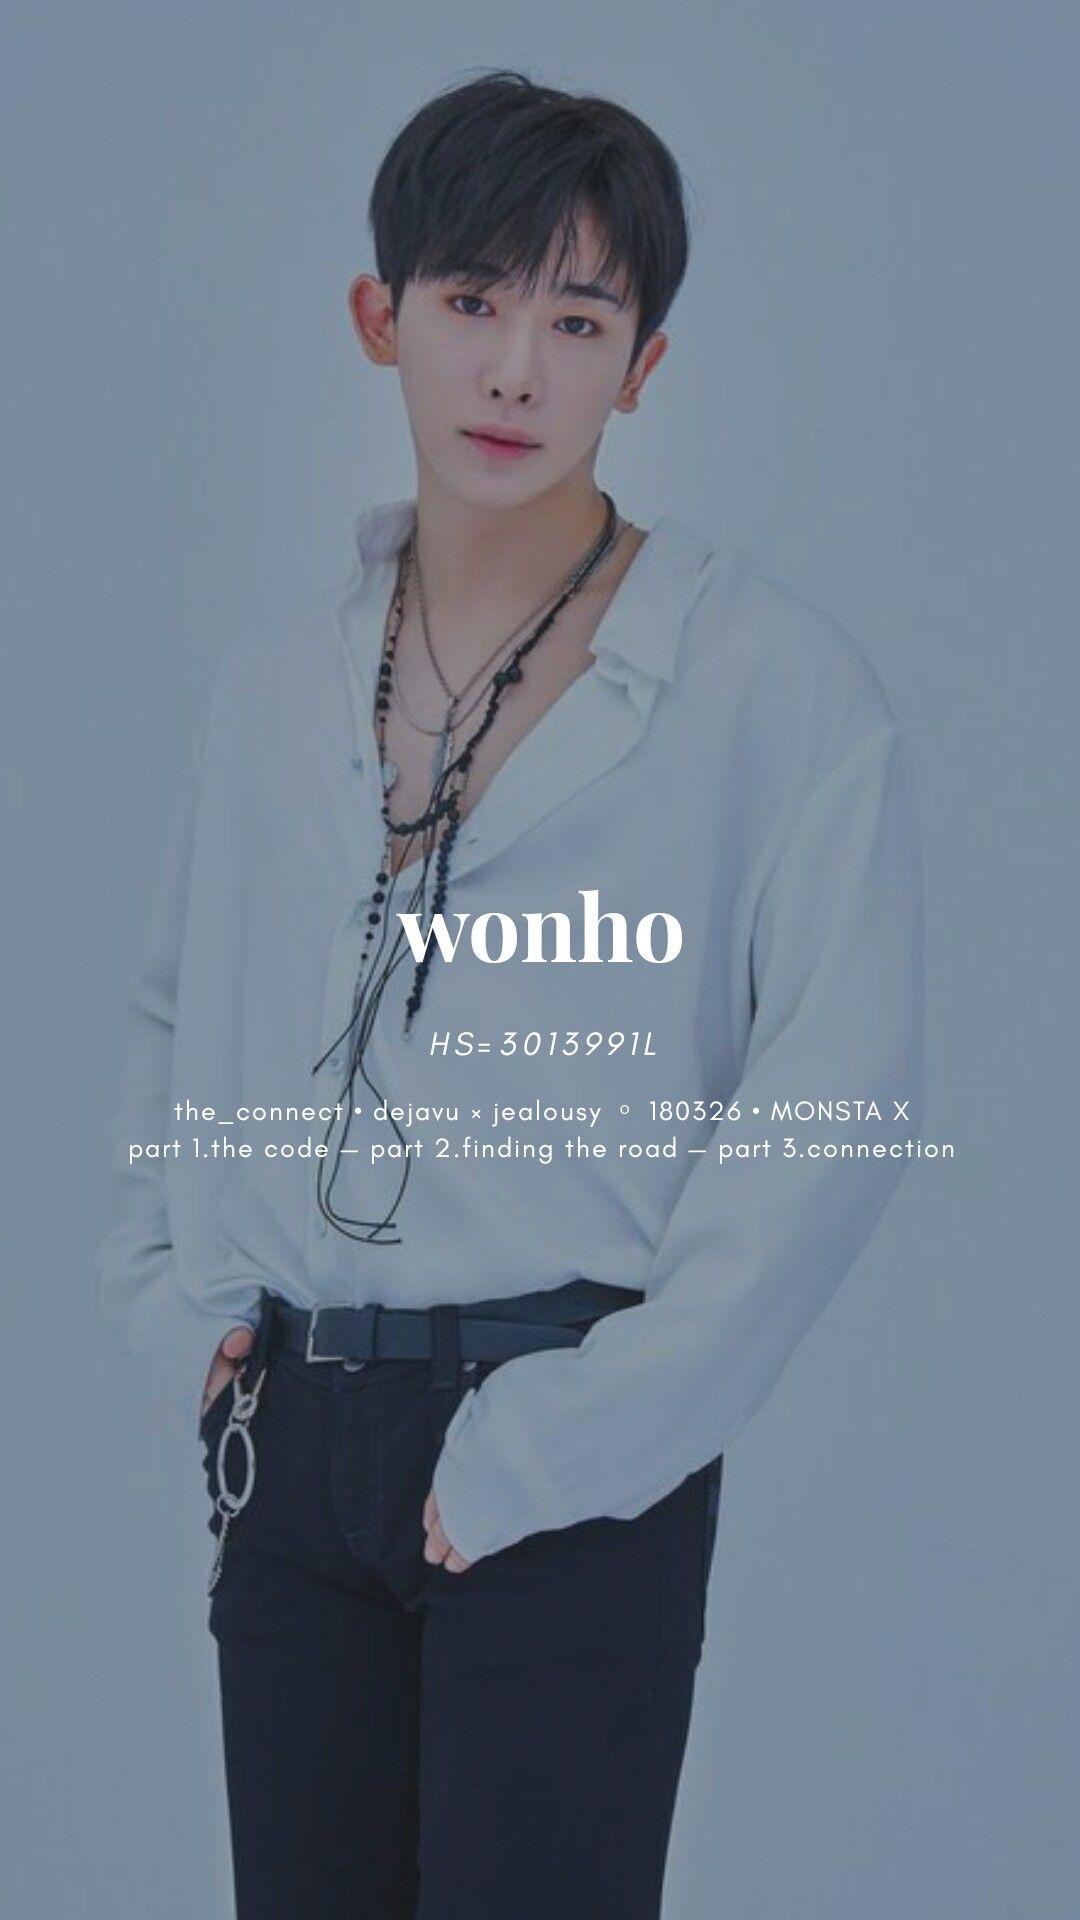 Wonho Monsta X Wallpaper Edits Monsta X Instagram Photo Video